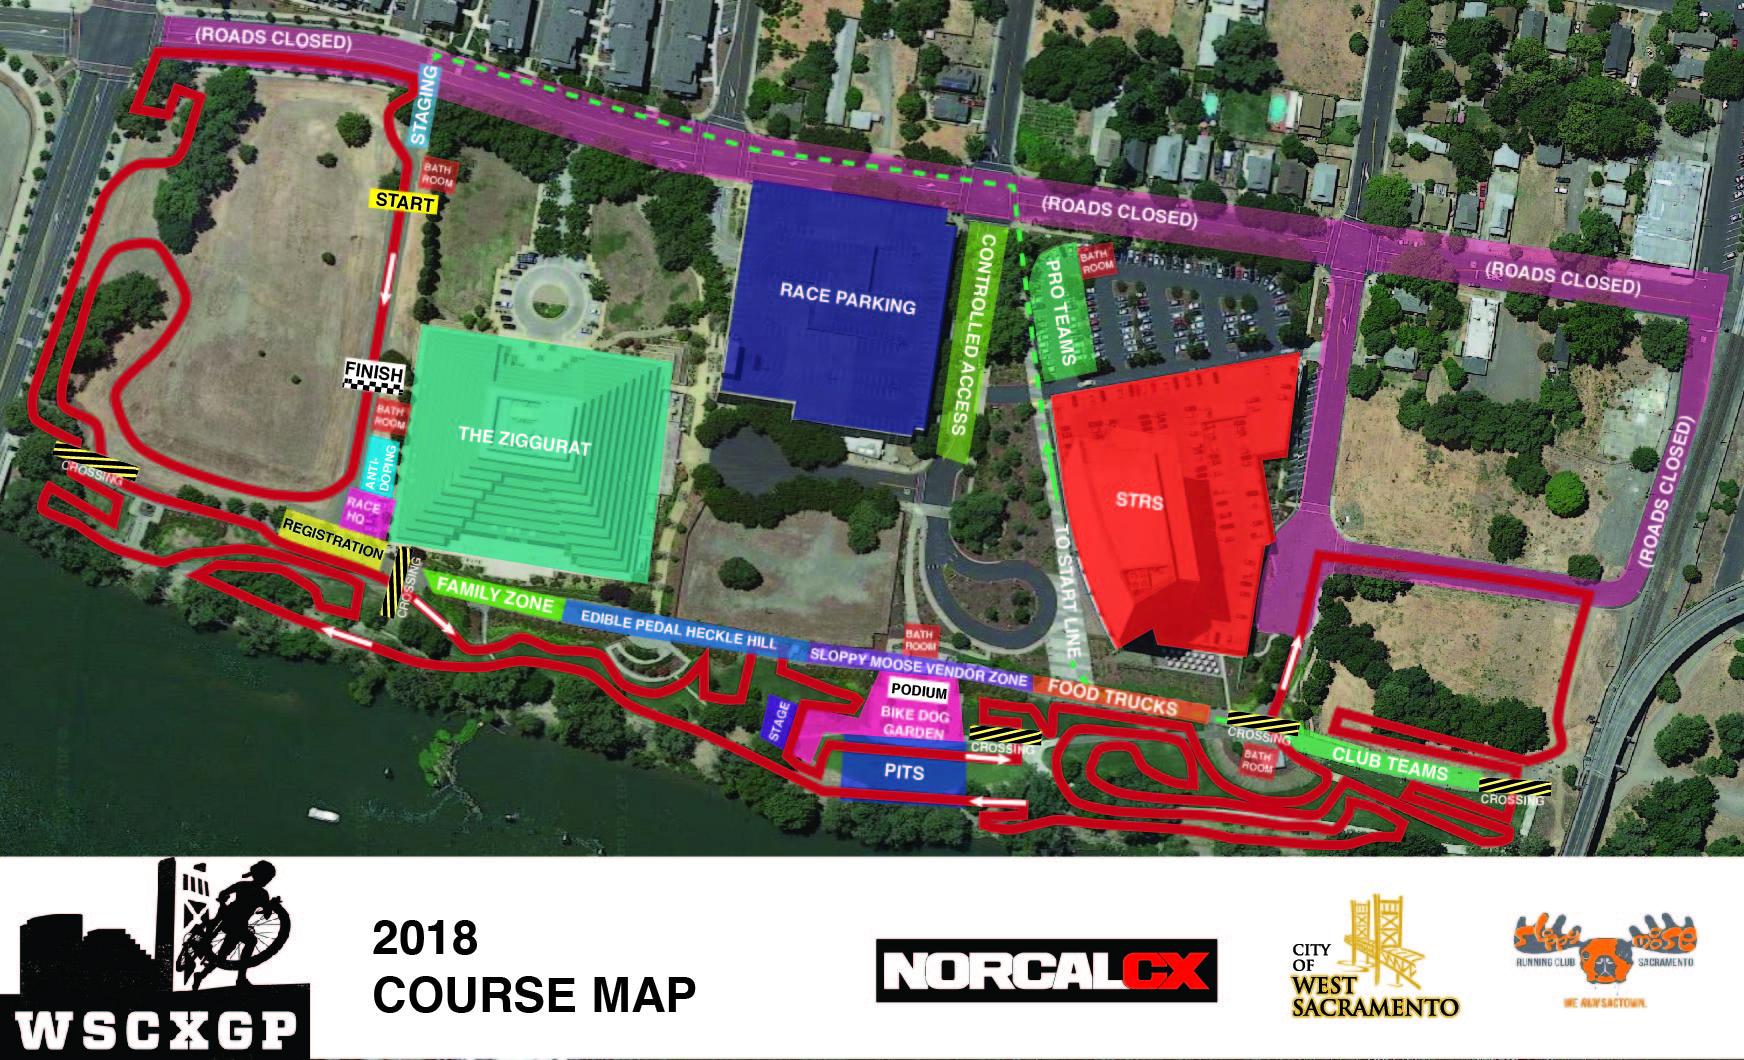 WSCXGP_UCI_MAP_2018 small.jpg